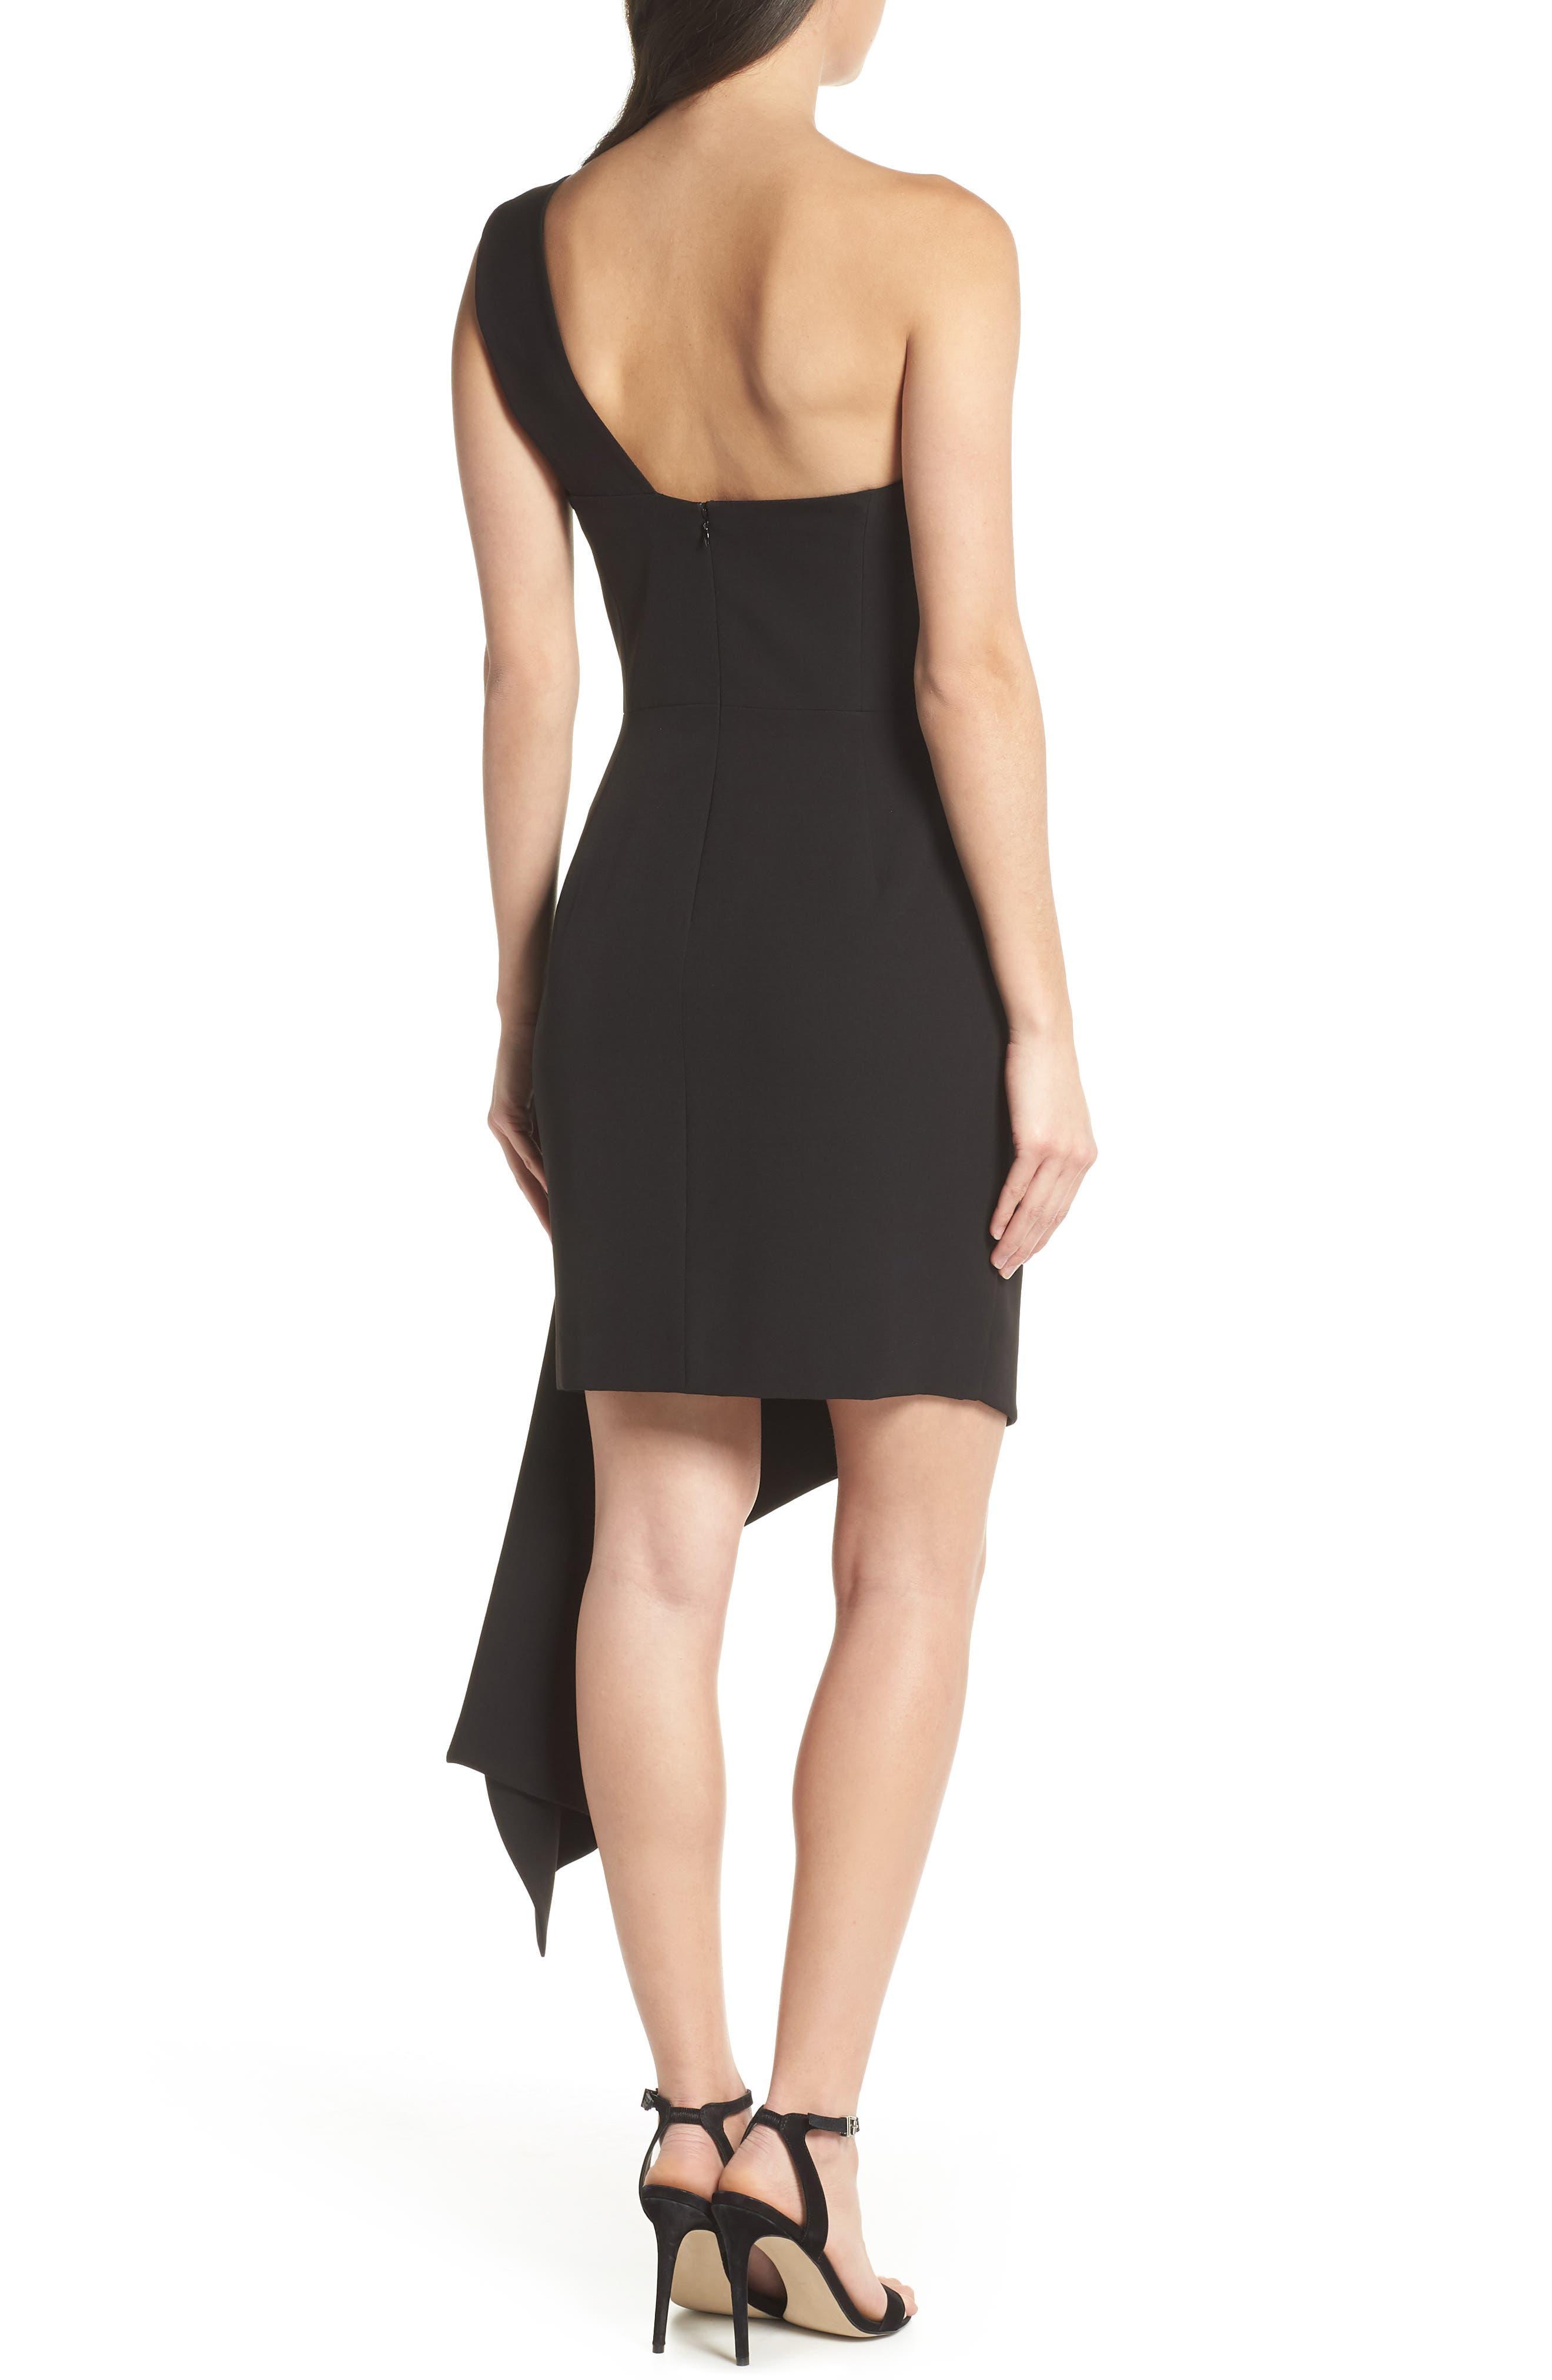 CLOVER AND SLOANE,                             One-Shoulder Asymmetric Dress,                             Alternate thumbnail 2, color,                             001